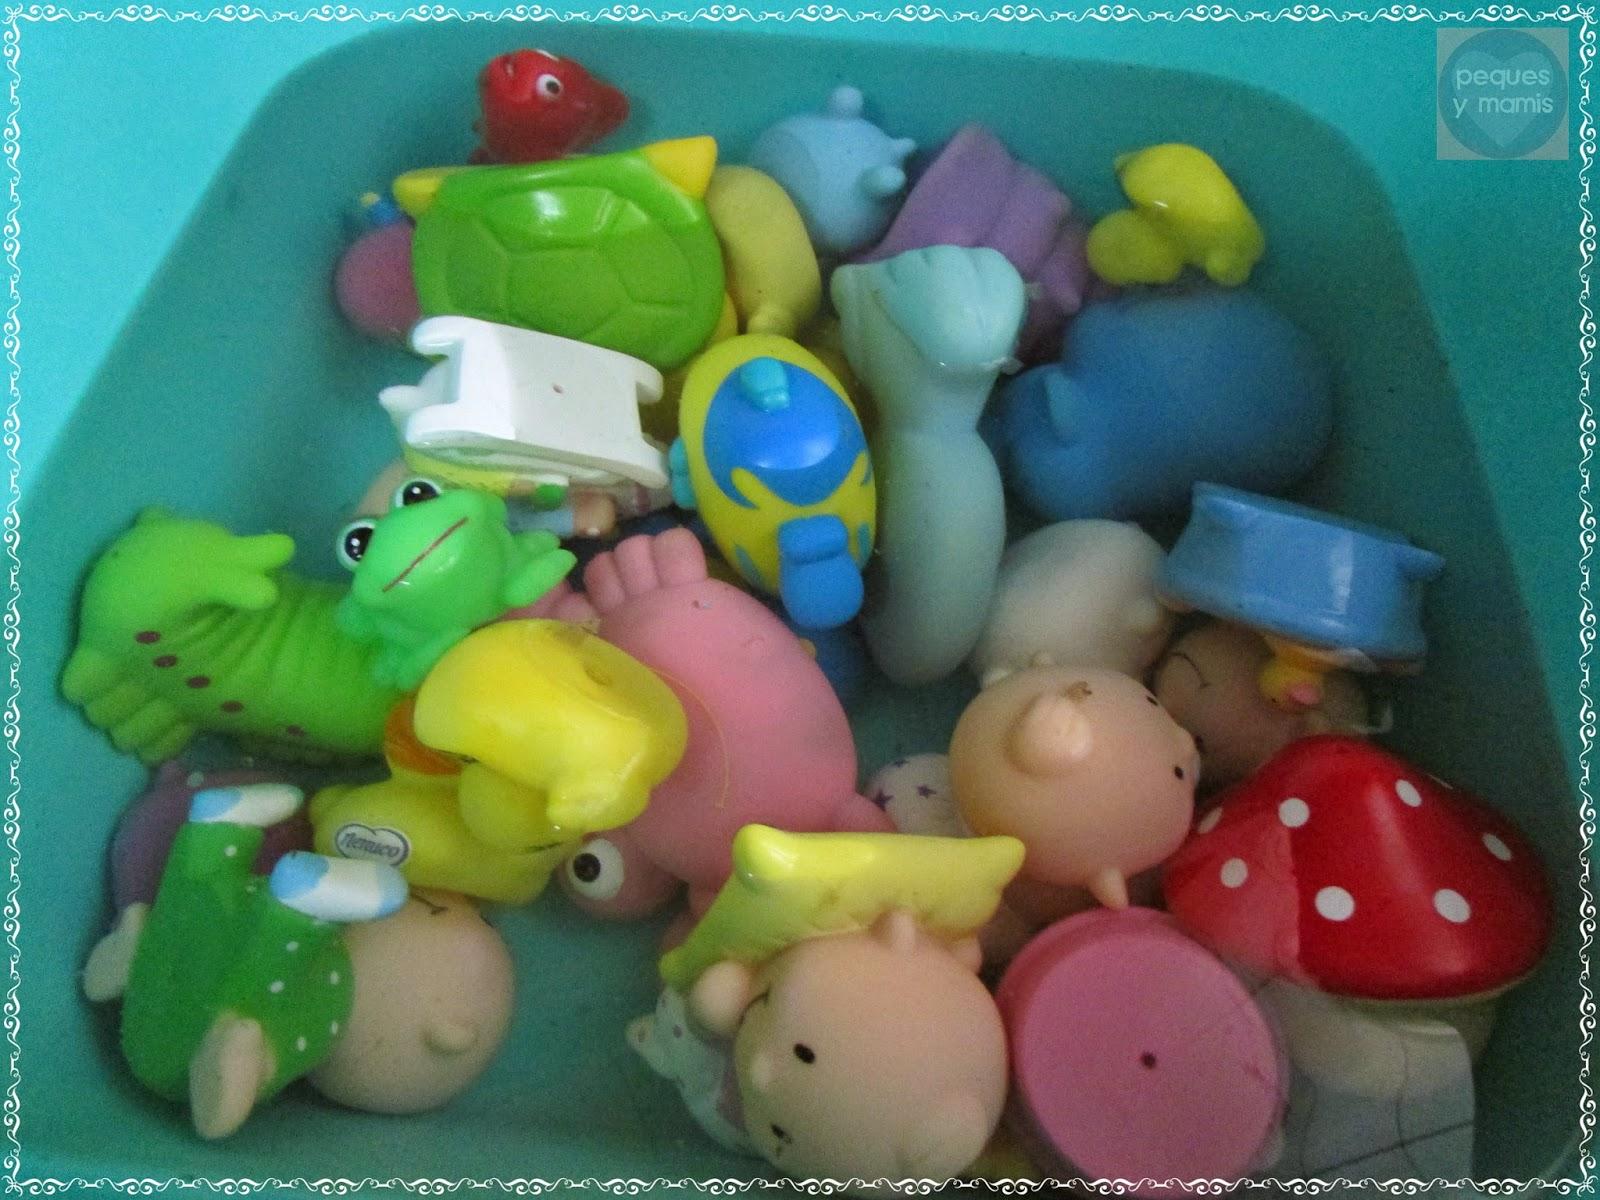 Pequesymamis limpiar los juguetes del ba o - Guarda juguetes bano ...